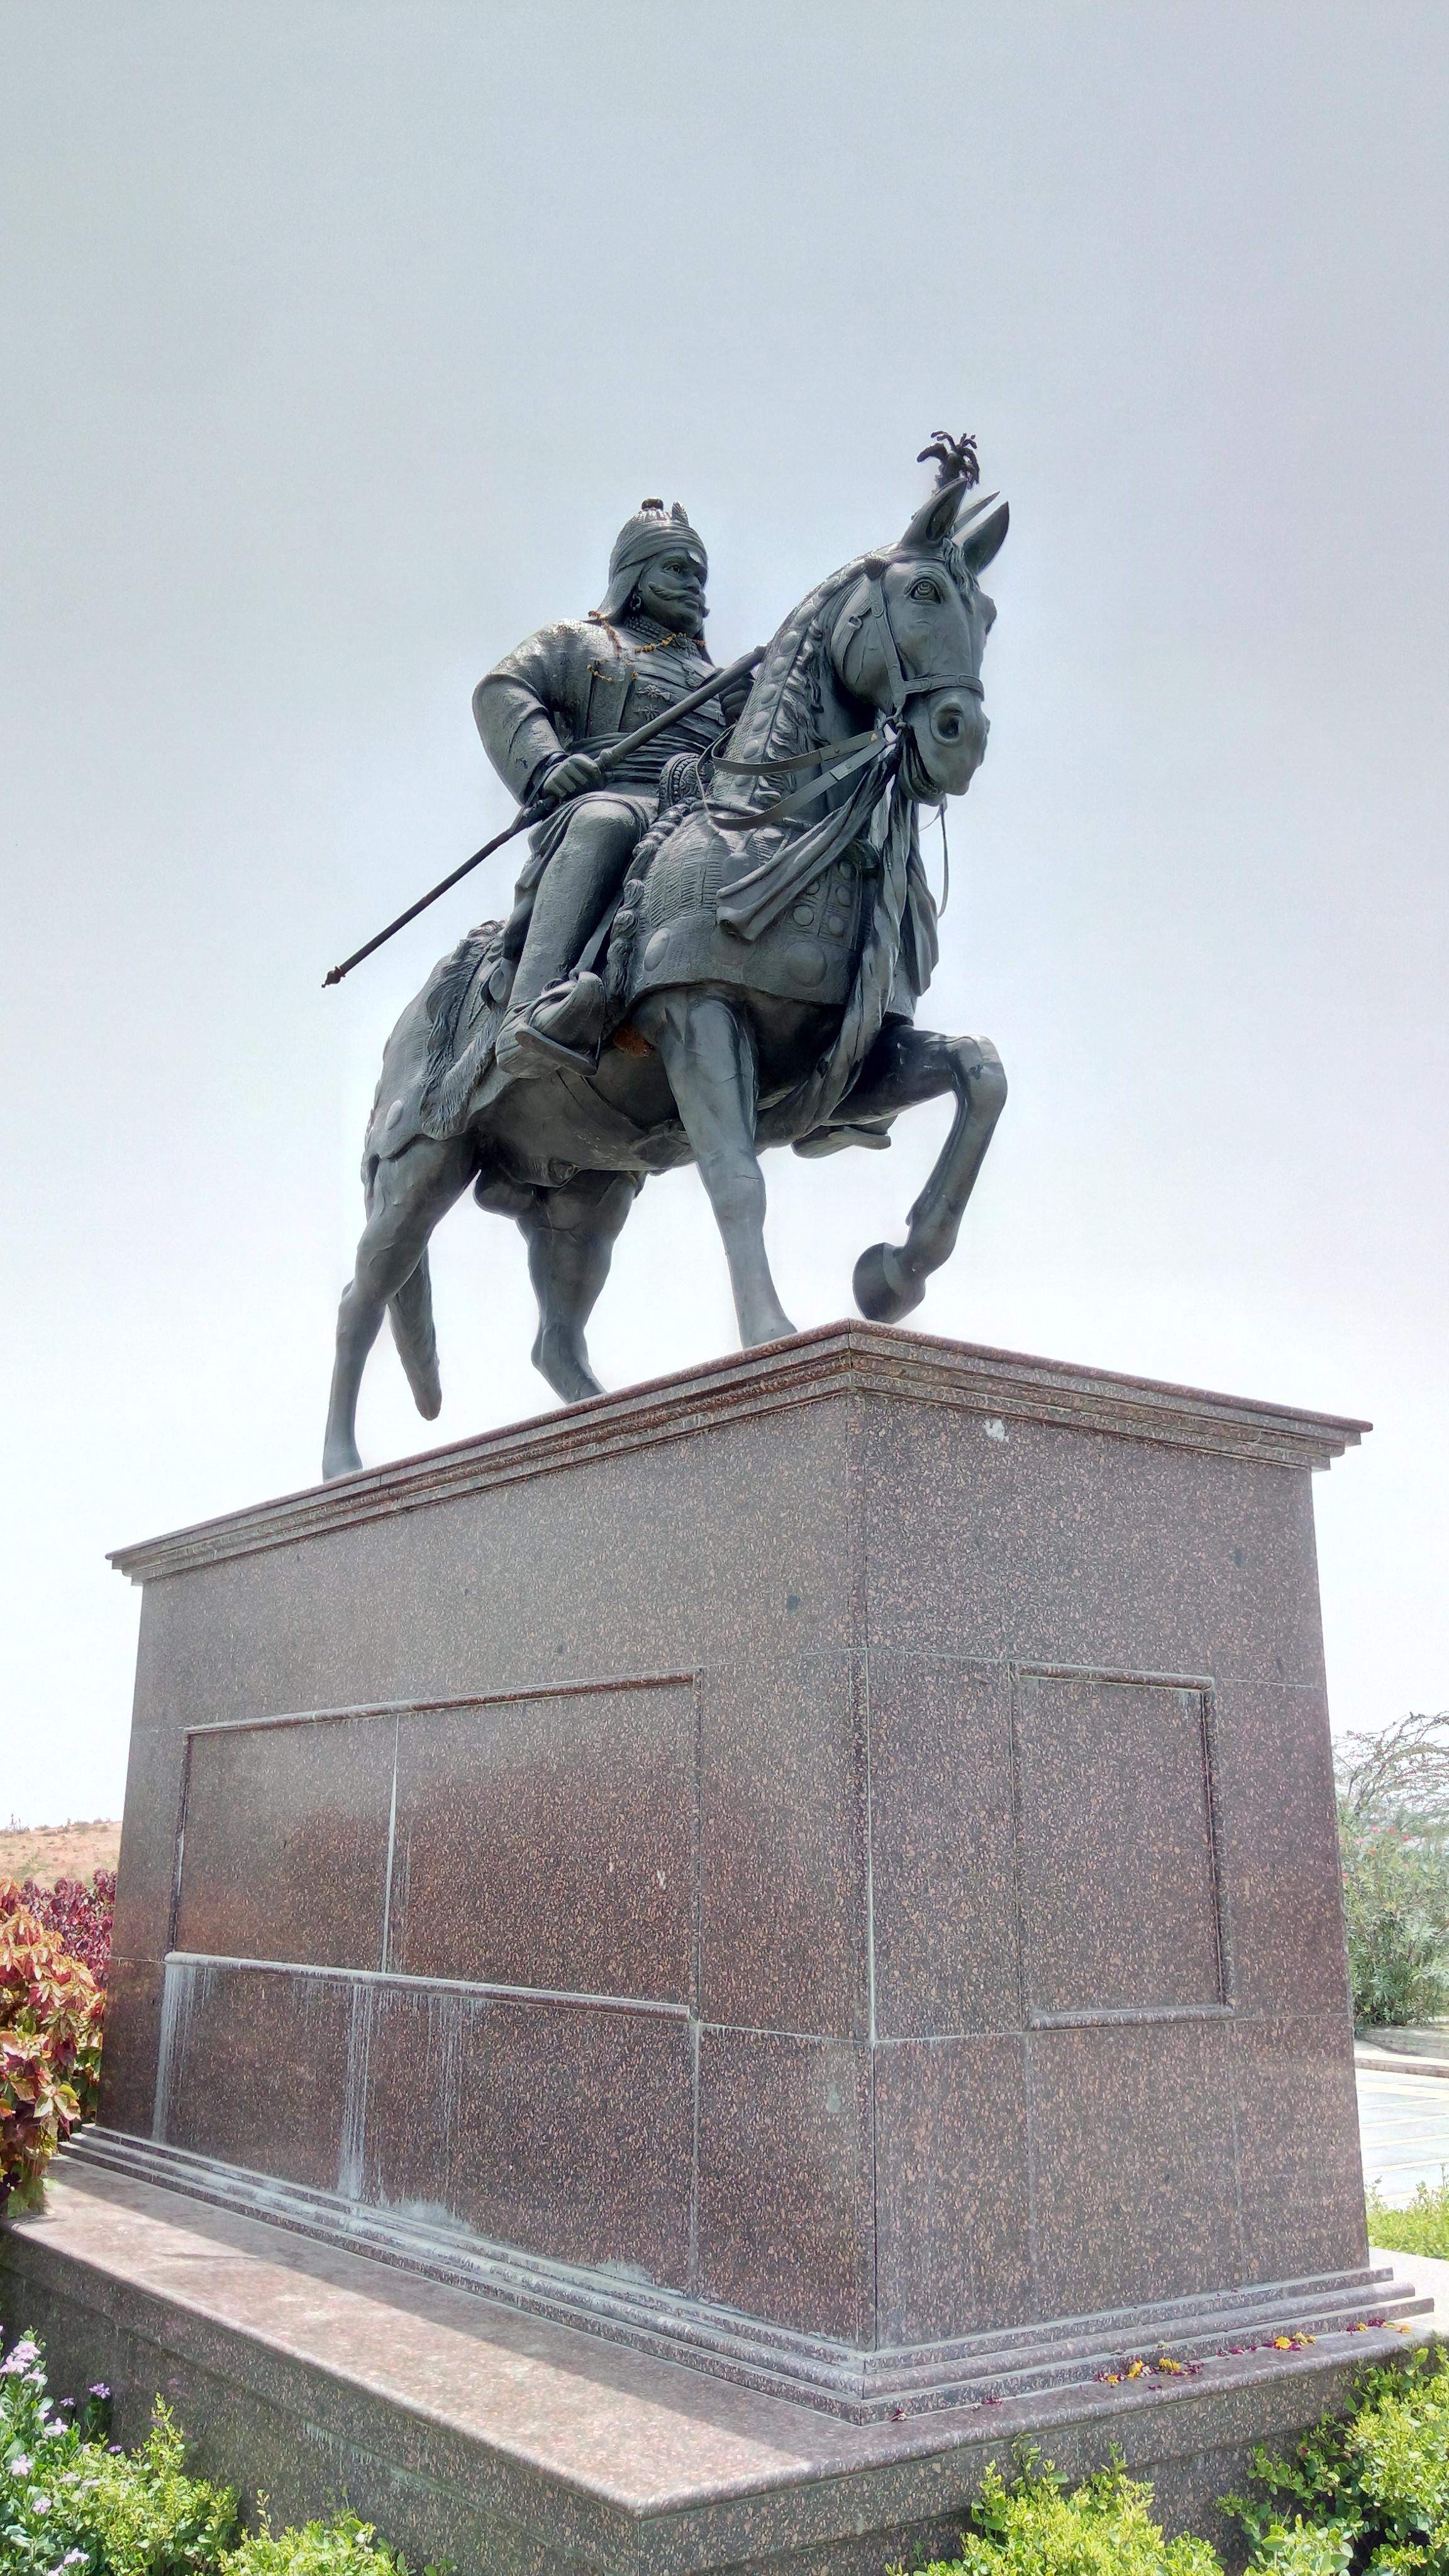 File:Statue of Maharana Pratap jpg - Wikimedia Commons